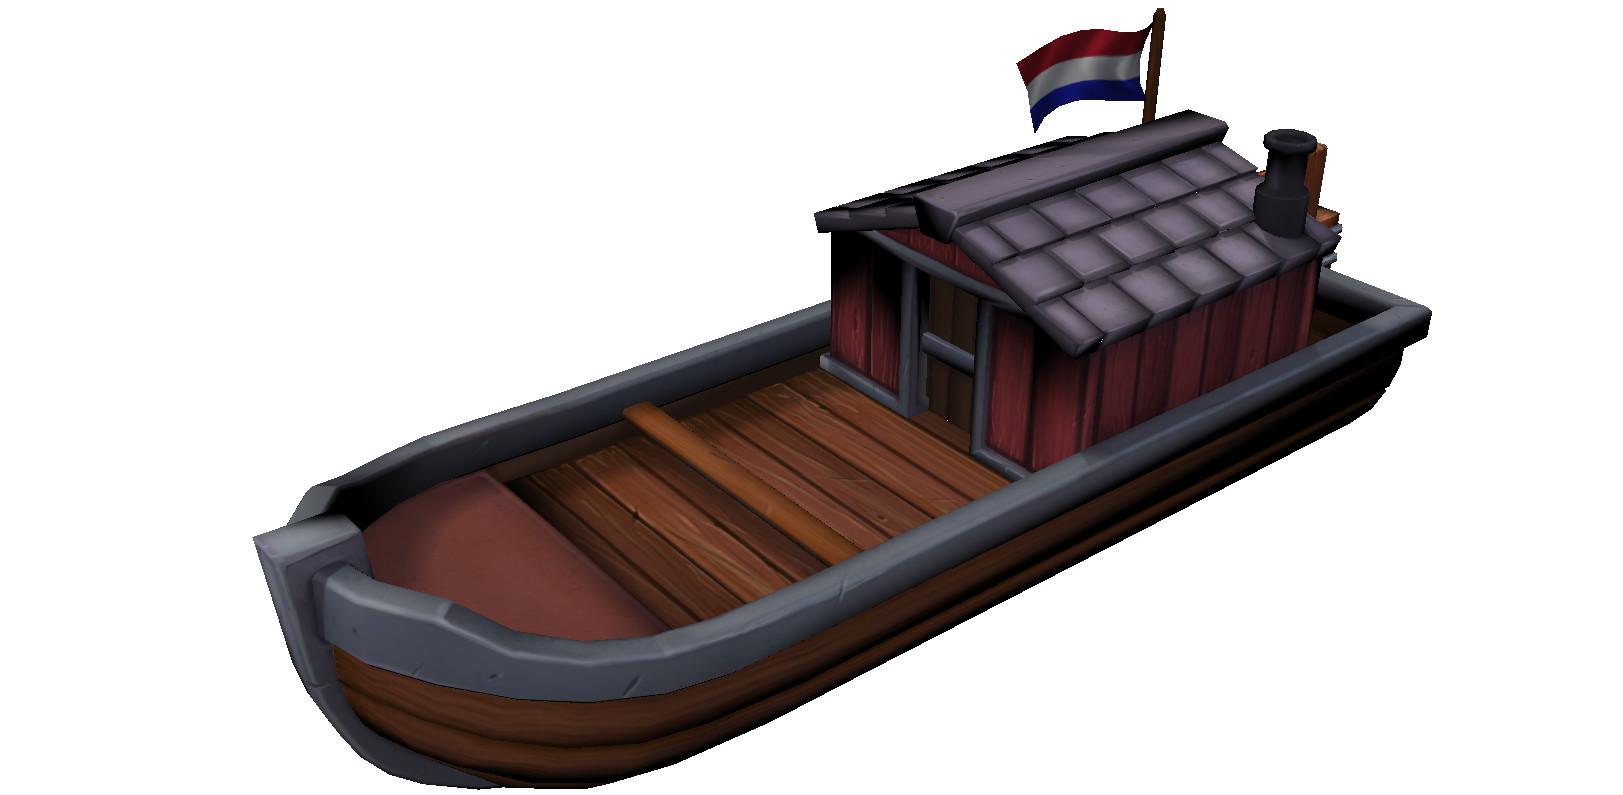 Sal vador thedarkcloak sal boat test7